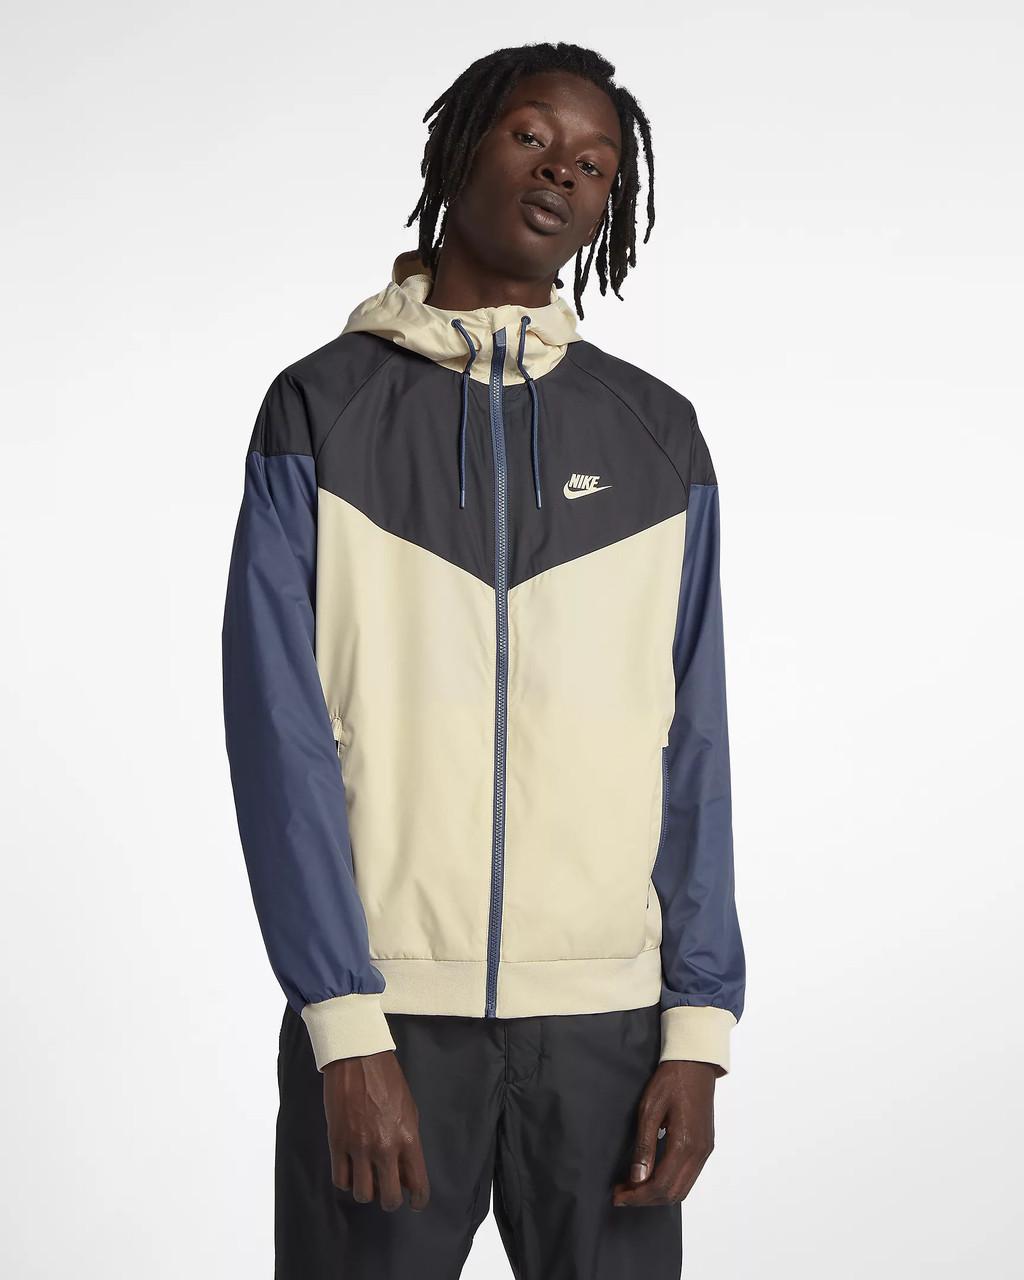 3b7fd977 Куртка Nike Sportswear Windrunner Jacket 727324-258 (Оригинал) M - Football  Mall -